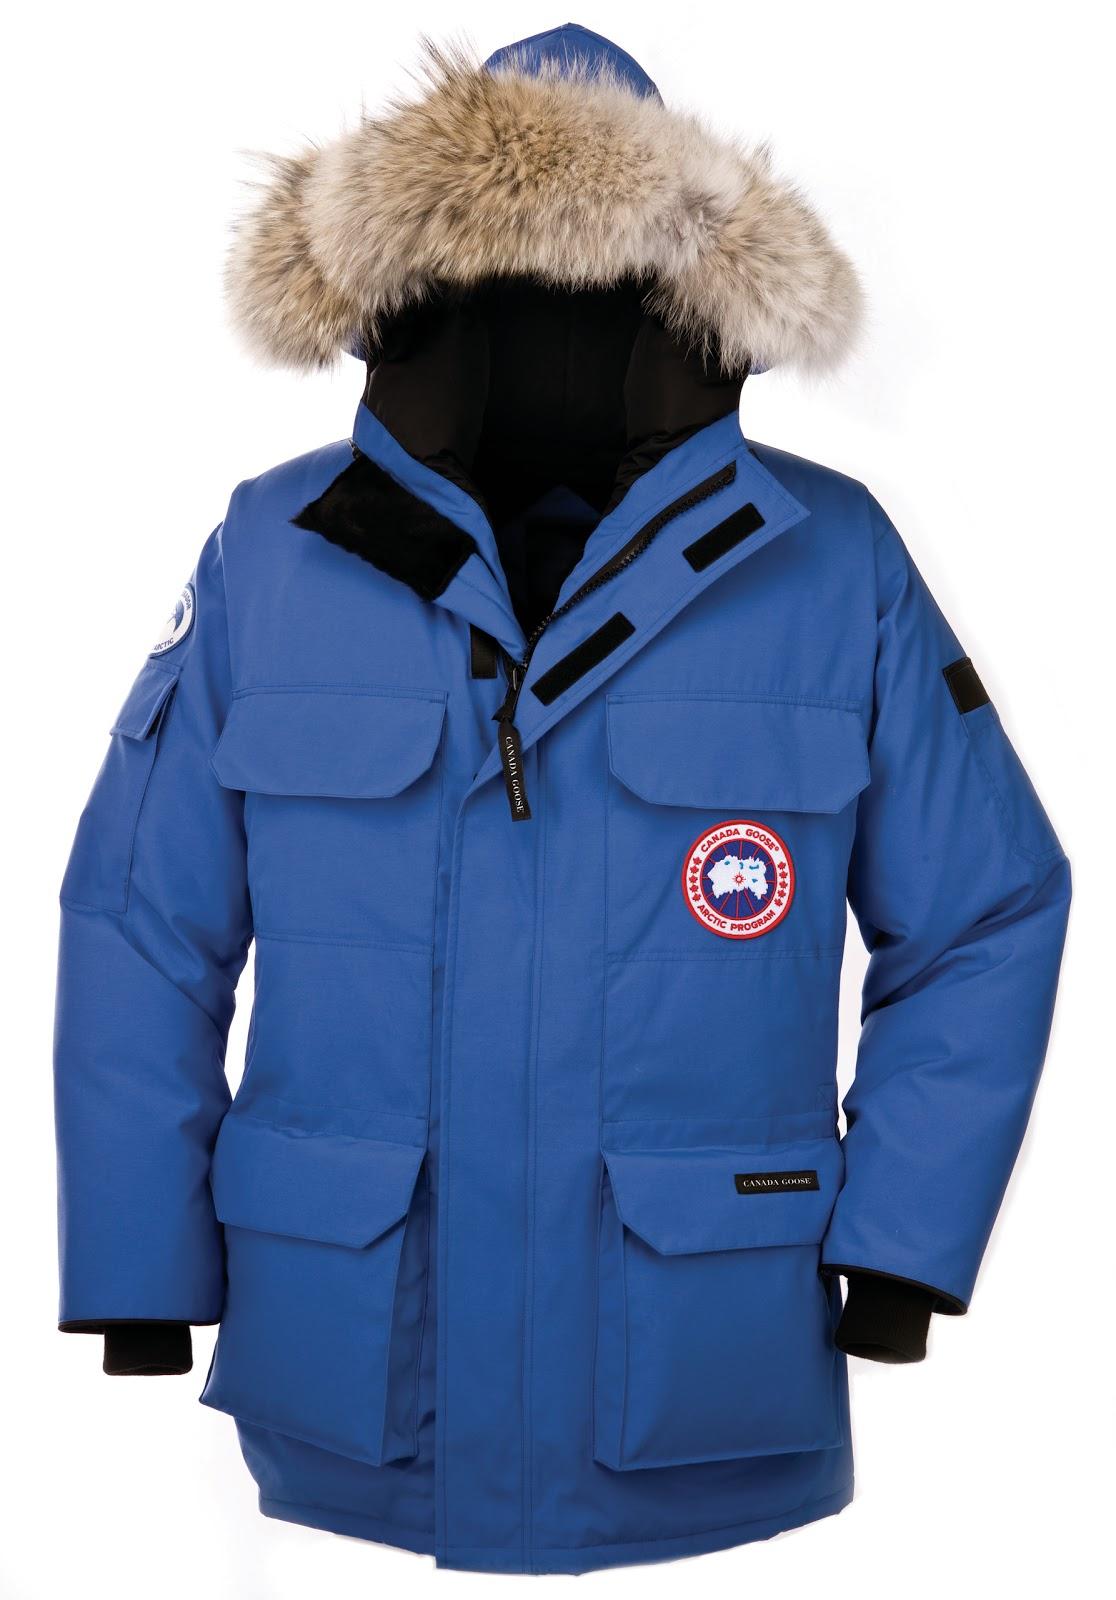 Canada Goose langford parka replica cheap - 14 oz. berlin blog: CANADA GOOSE >>> BRAVE THE ELEMENTS